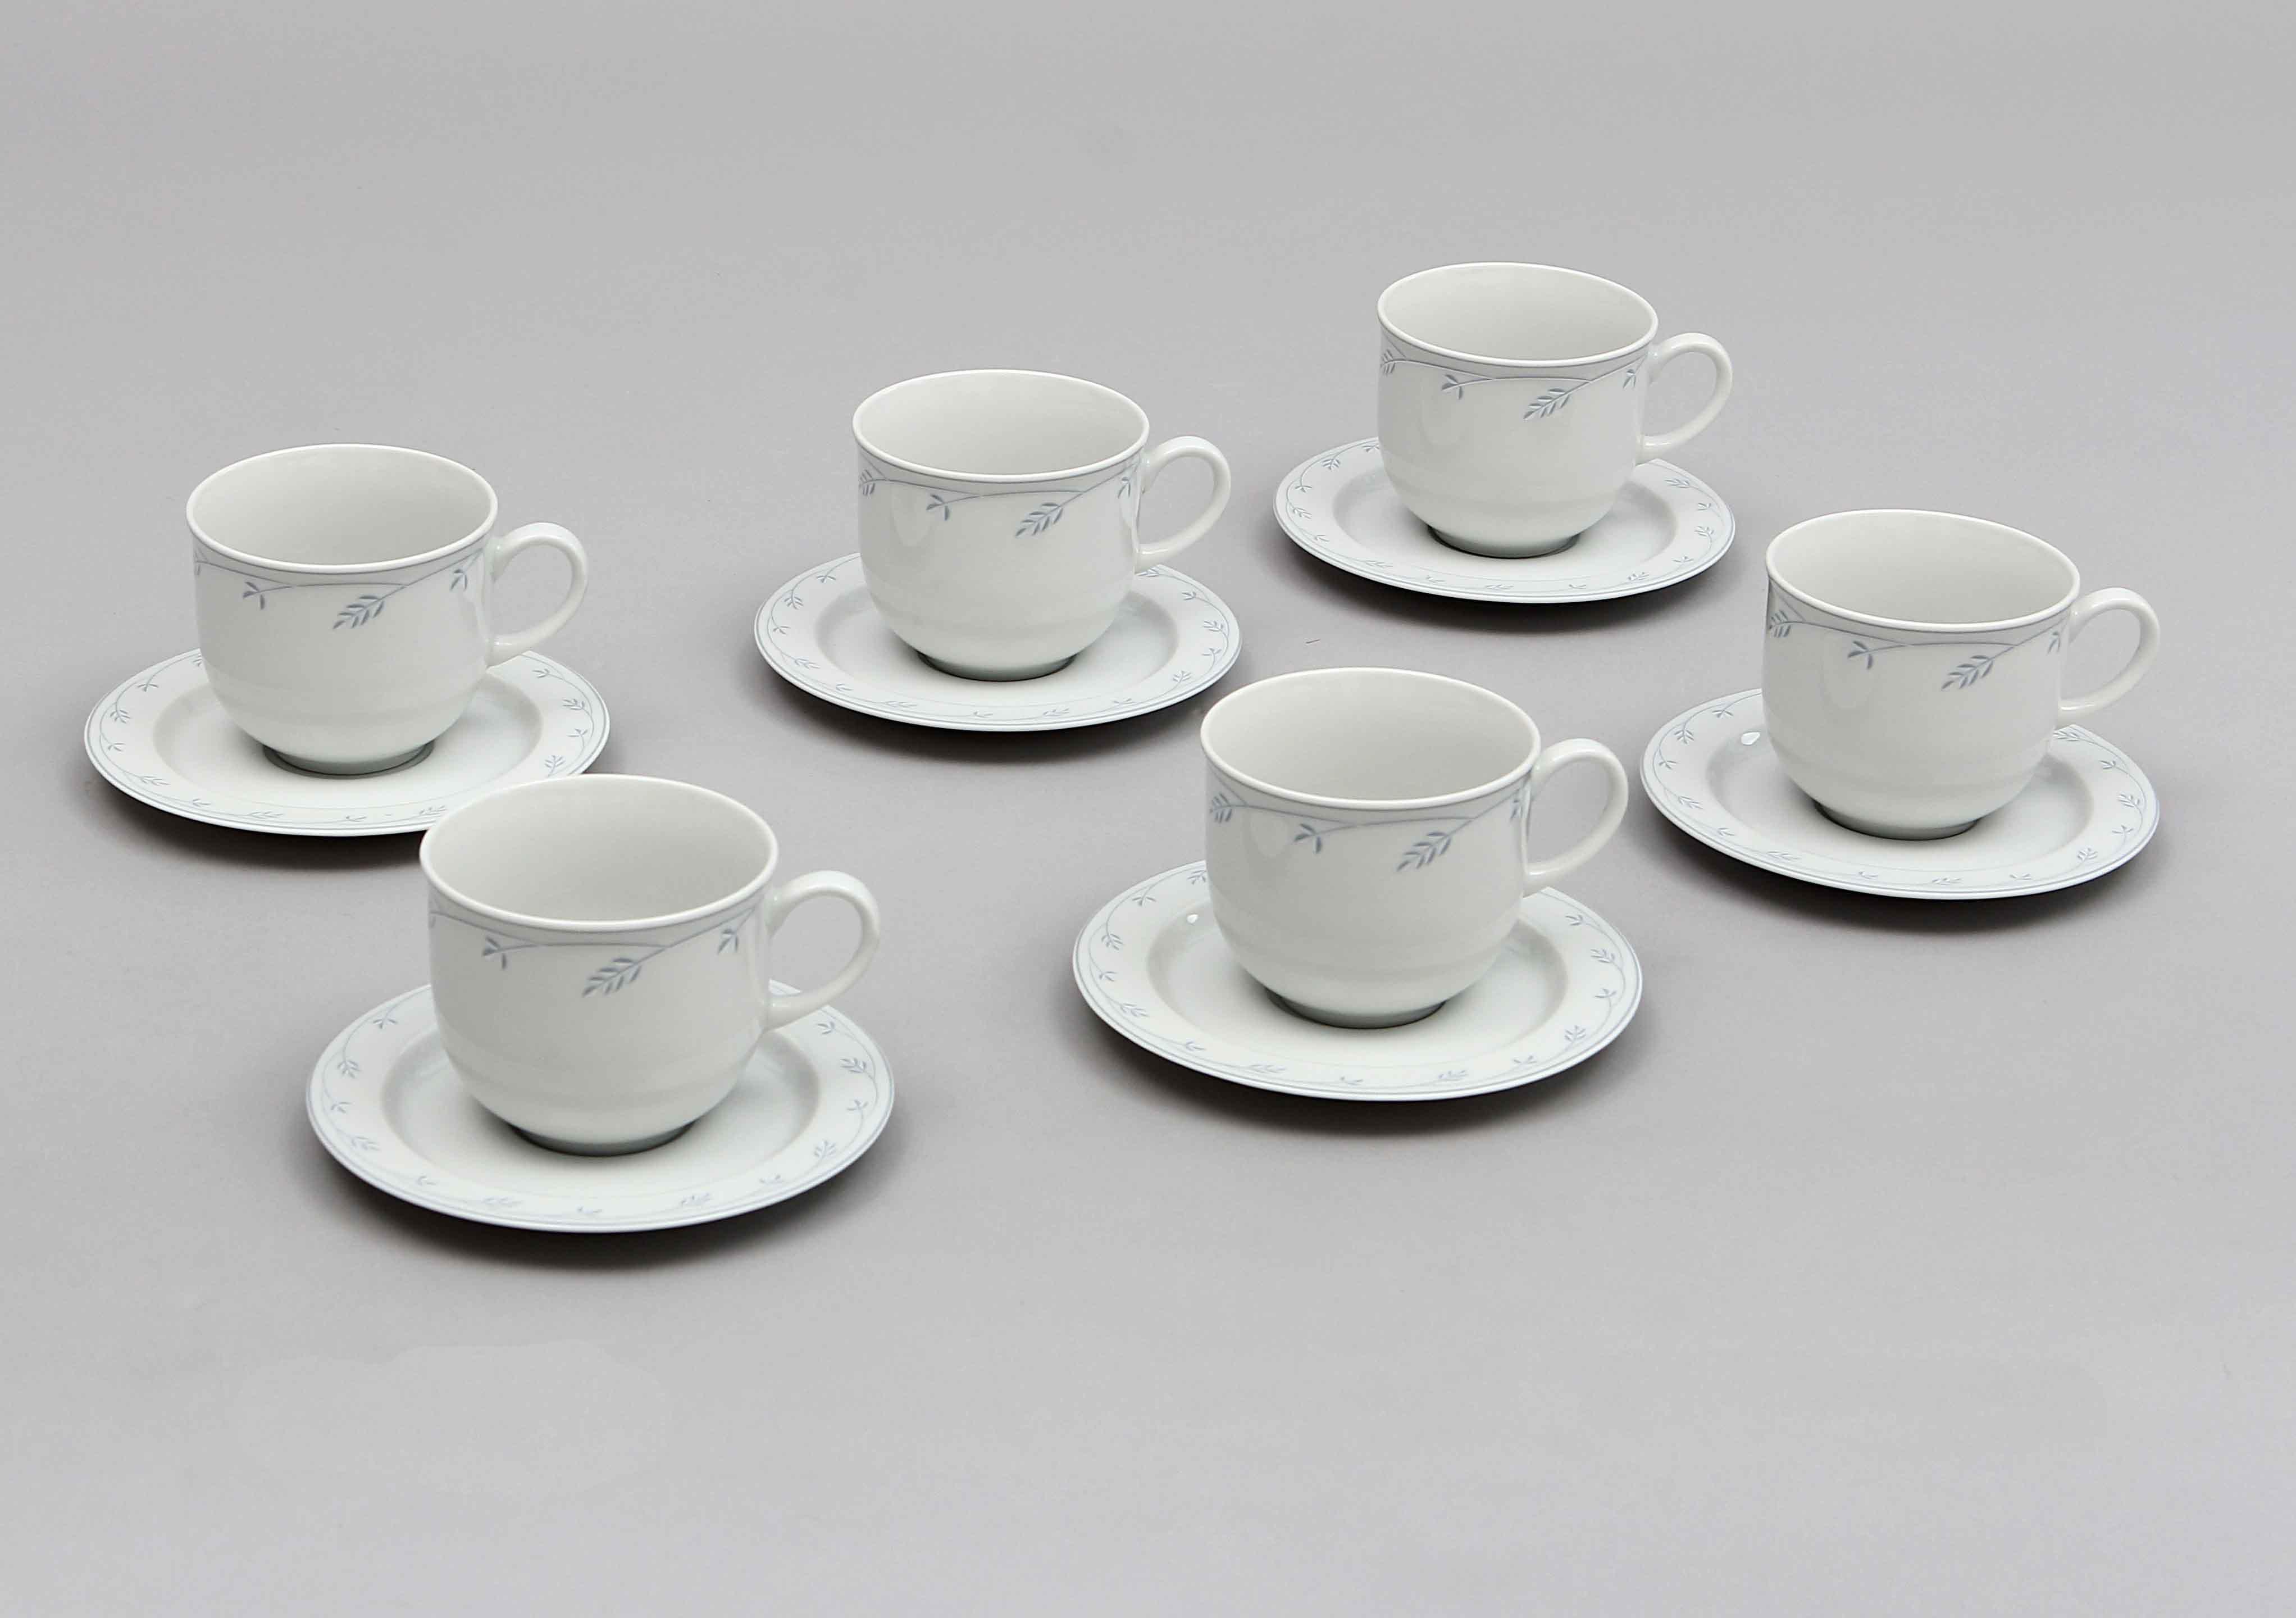 Šálky na kávu, karlovarský porcelán Thun, Opal klásky, 6 ks